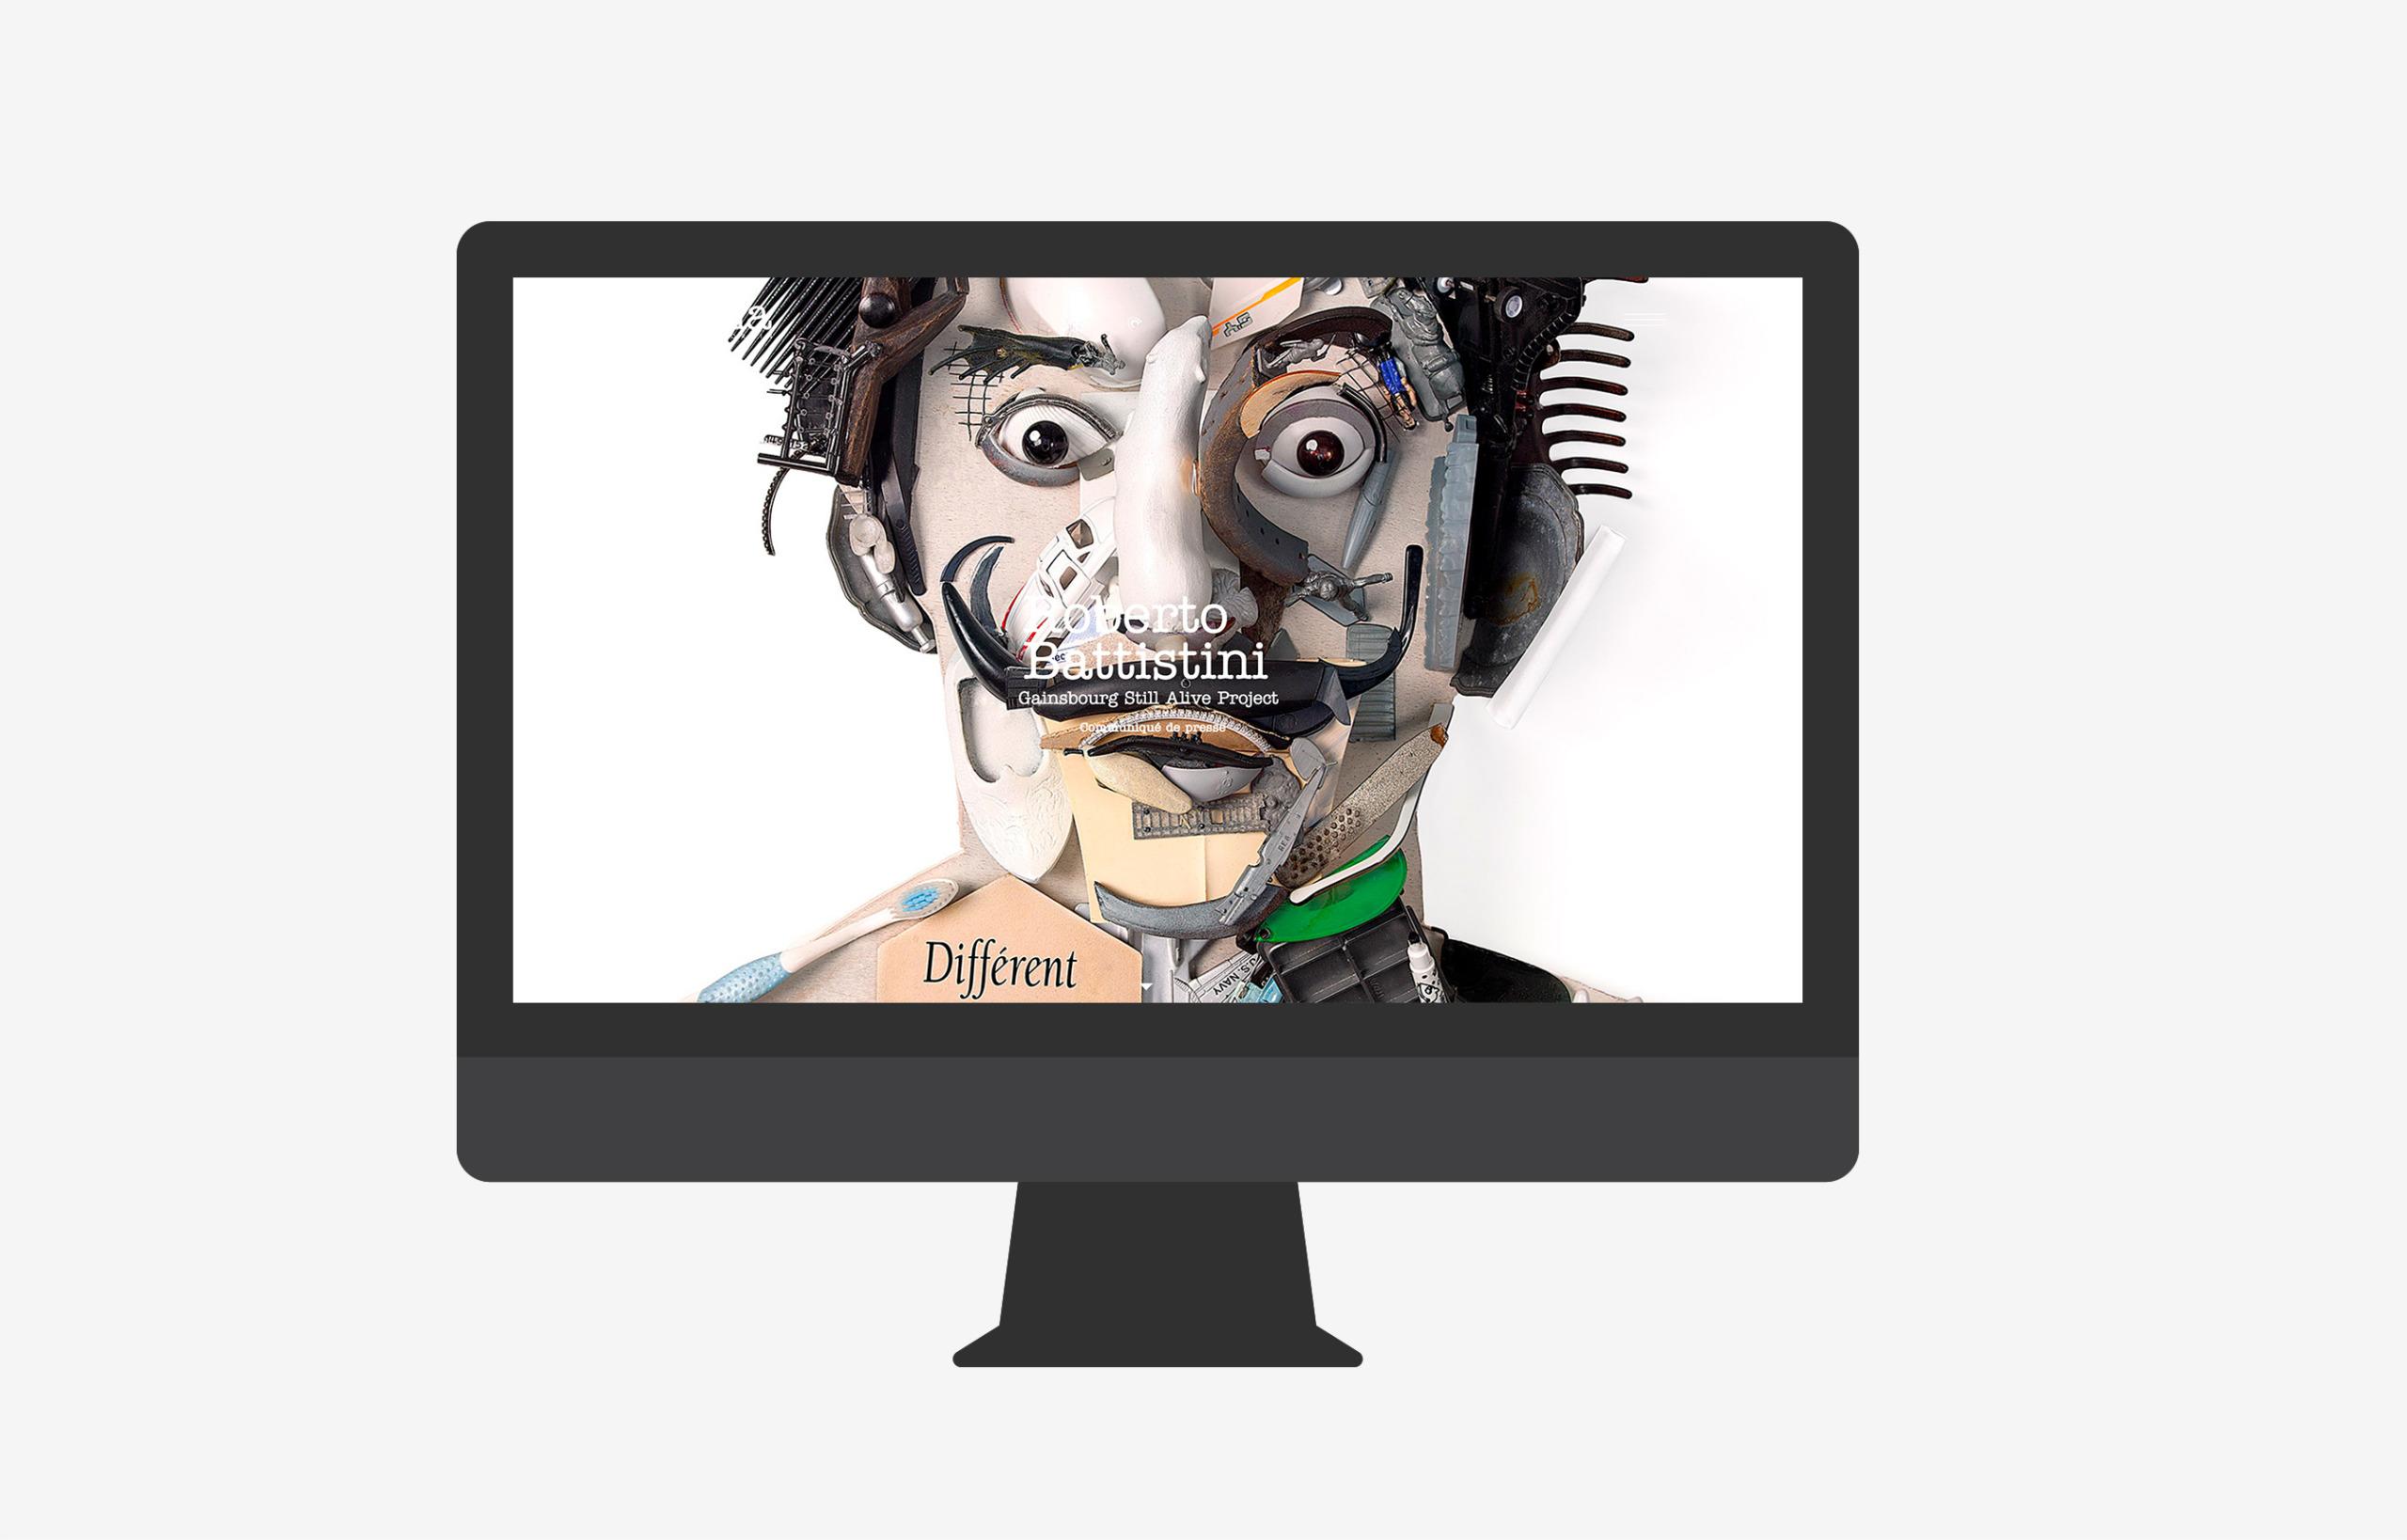 05-bettina-pikteo-webdesign-graphic-design-freelance-paris-bruxelles-londres